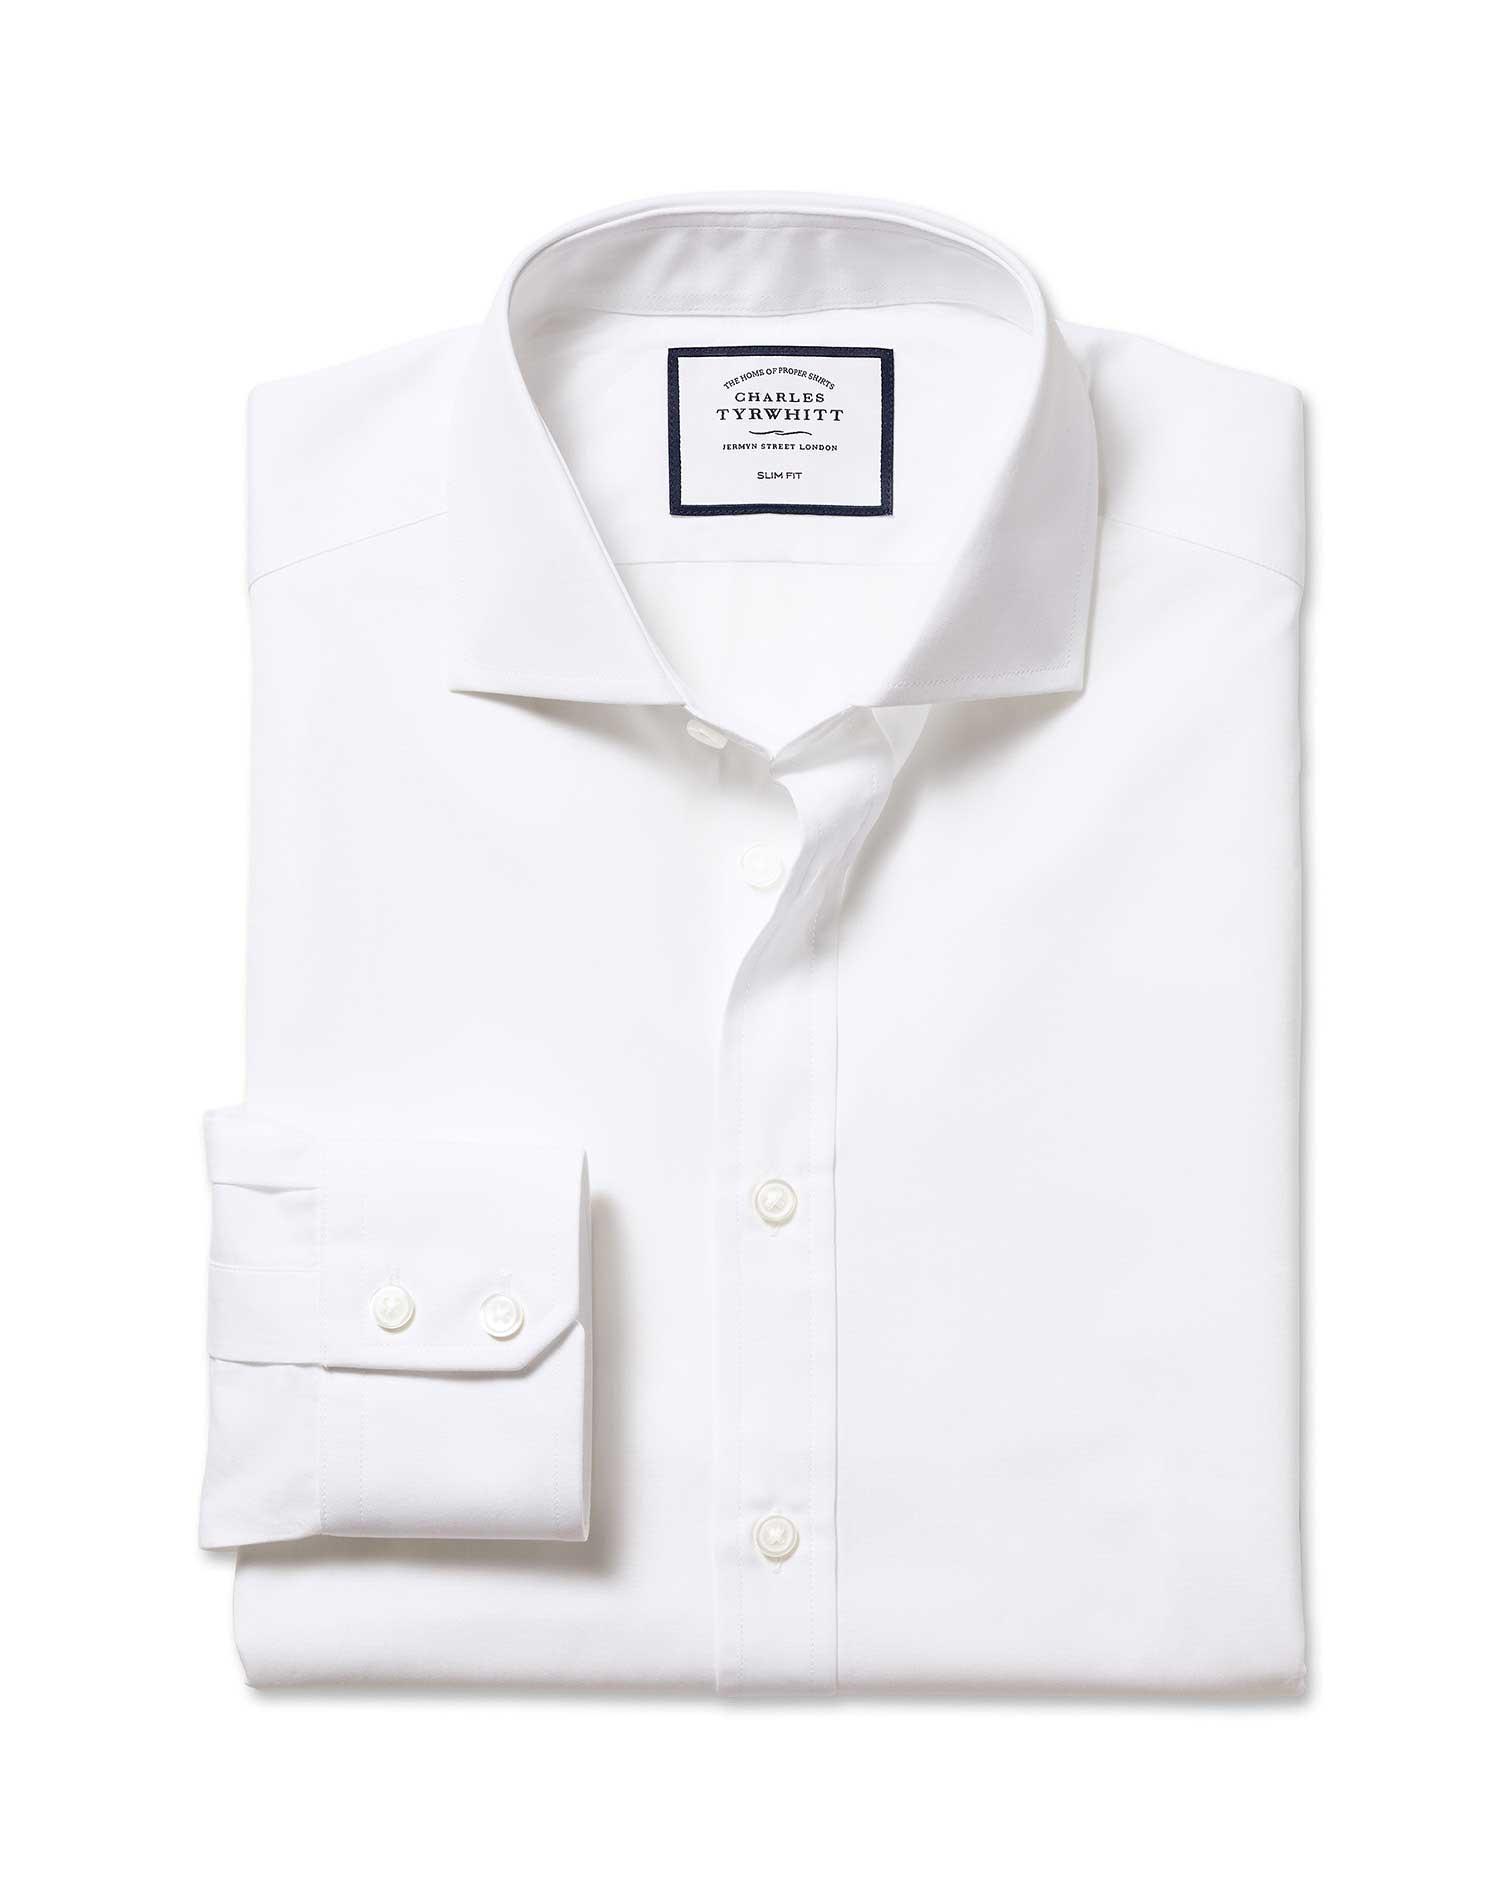 Slim Fit Cutaway Egyptian Cotton Poplin White Formal Shirt Single Cuff Size 16/35 by Charles Tyrwhit